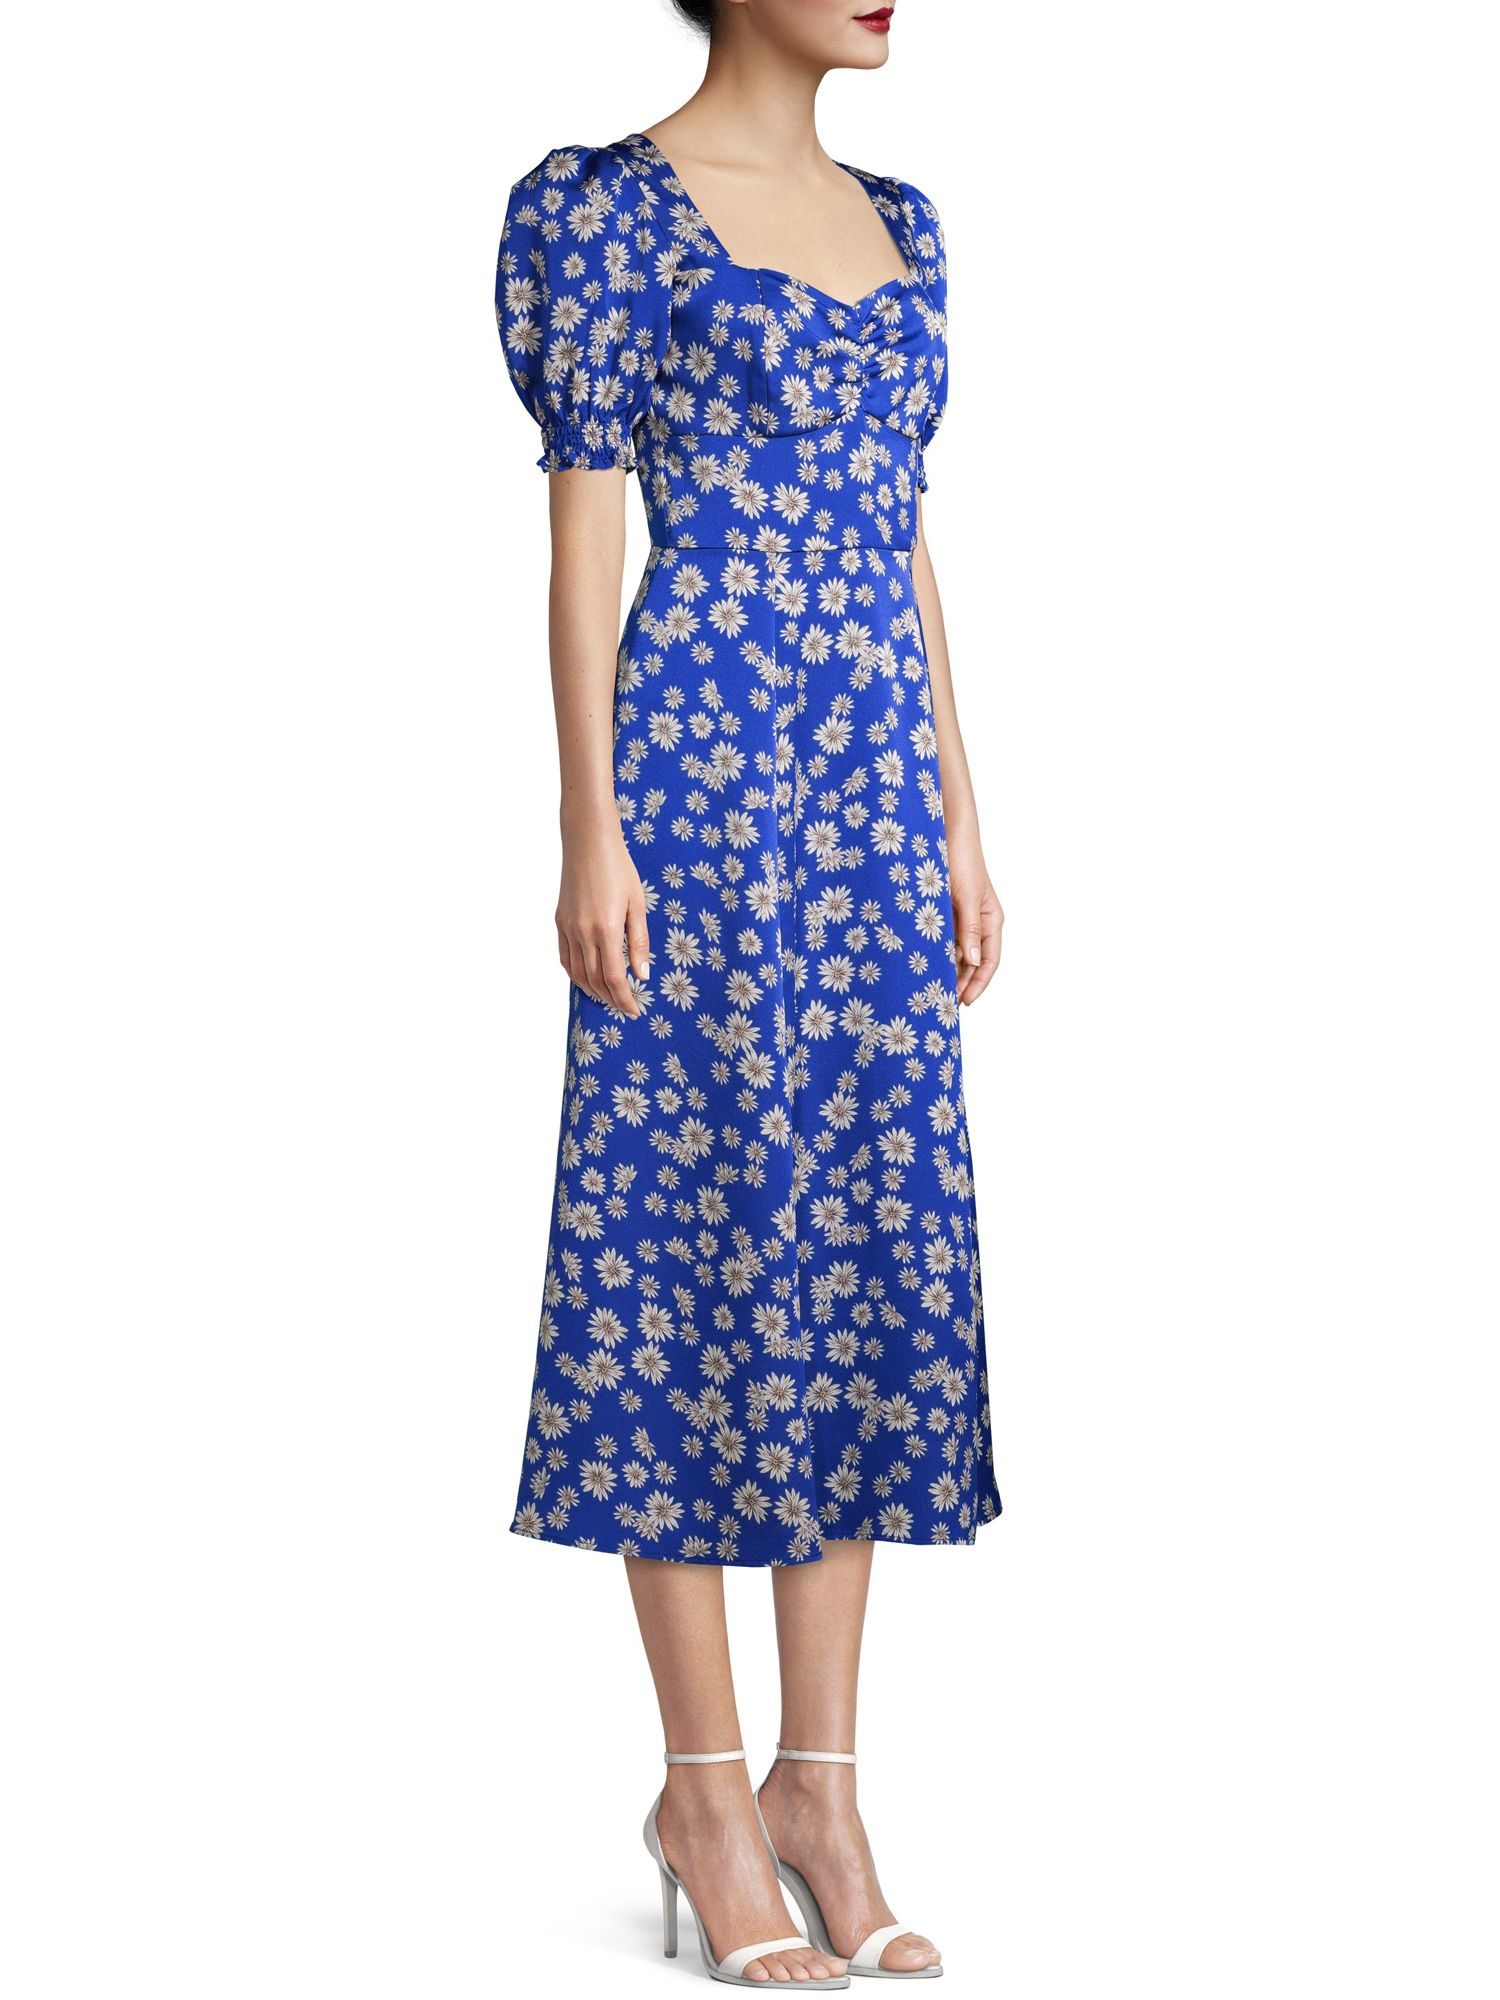 Prospect The Label Prospect The Label Women S Bustier Midi Dress Walmart Com Midi Dress Dresses Bustier [ 2000 x 1500 Pixel ]